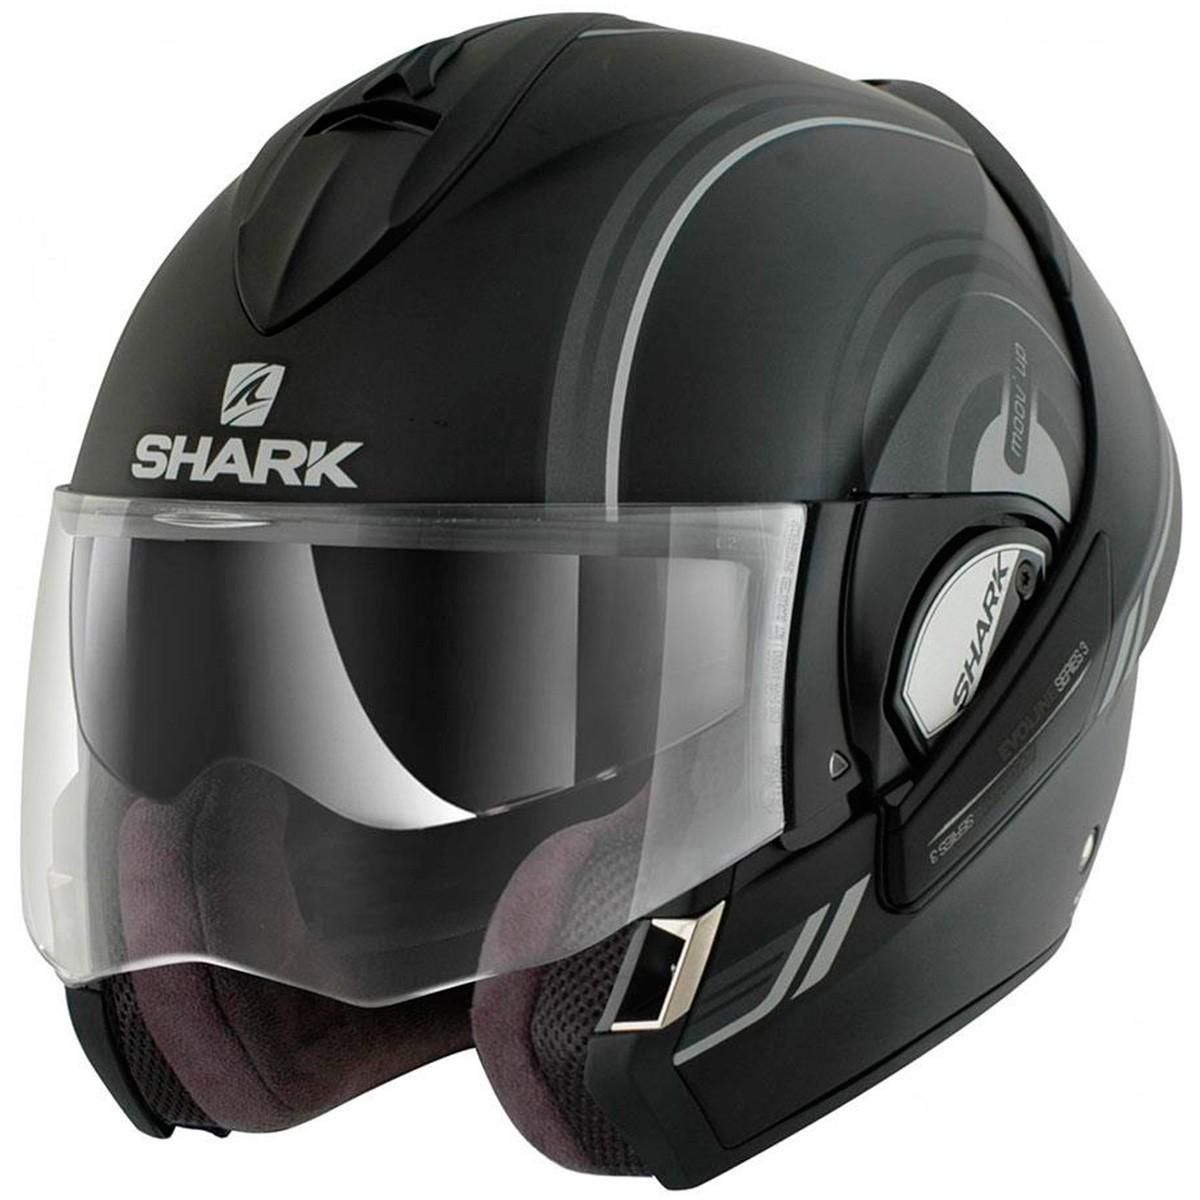 Capacete Shark Evoline Serie 3 Moov Up Matt KAW  - Super Bike - Loja Oficial Alpinestars